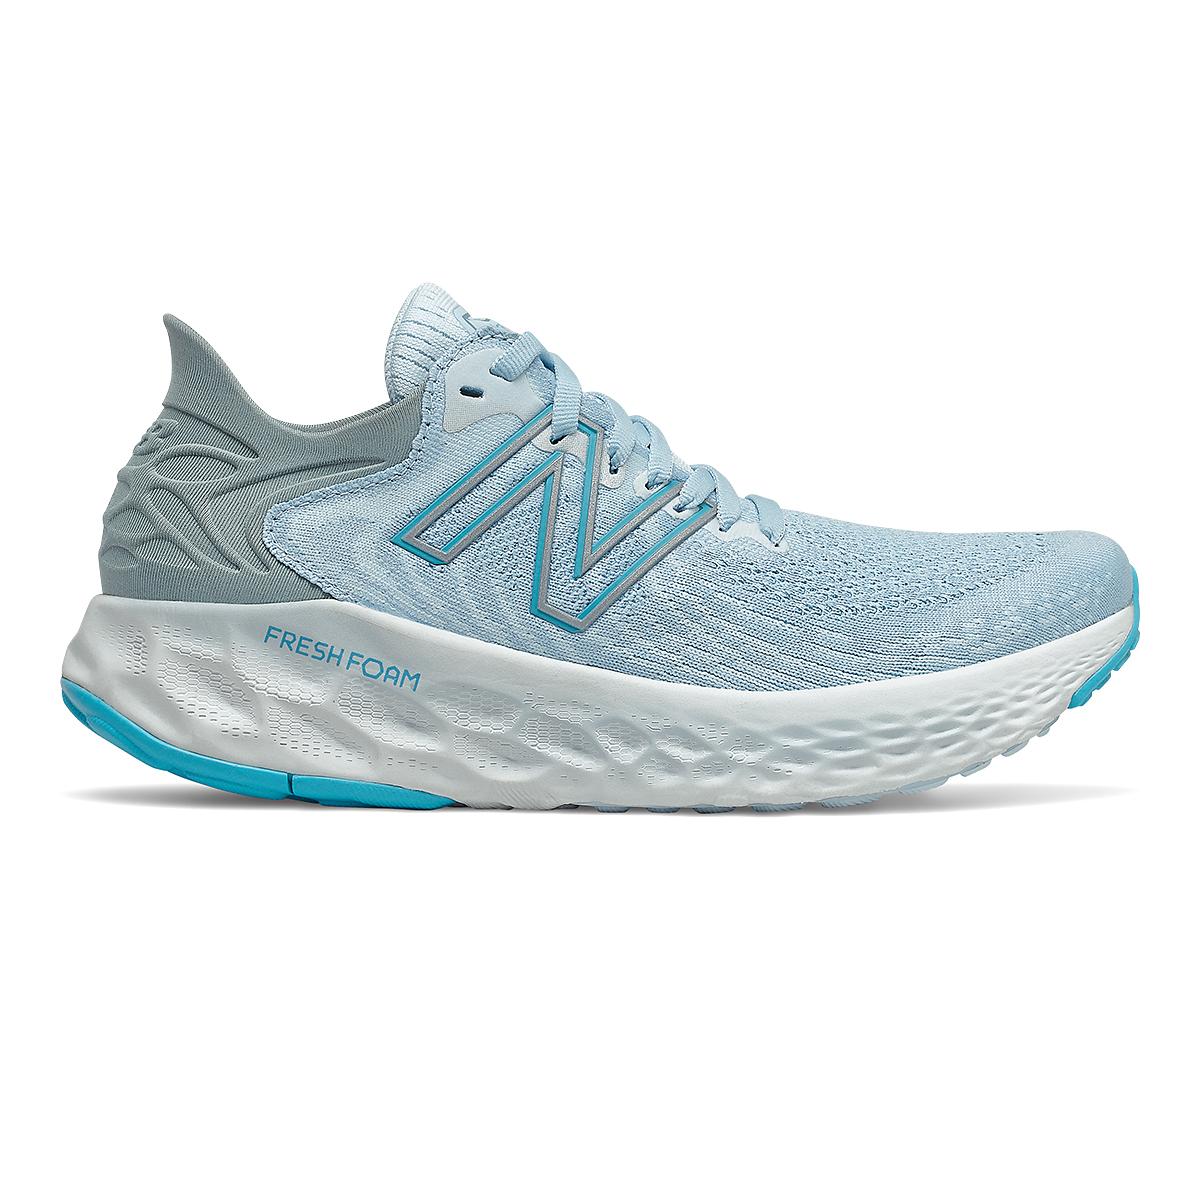 Women's New Balance 1080v11 Running Shoe - Color: Uv Glo/Star Glo - Size: 5 - Width: Extra Wide, Uv Glo/Star Glo, large, image 1